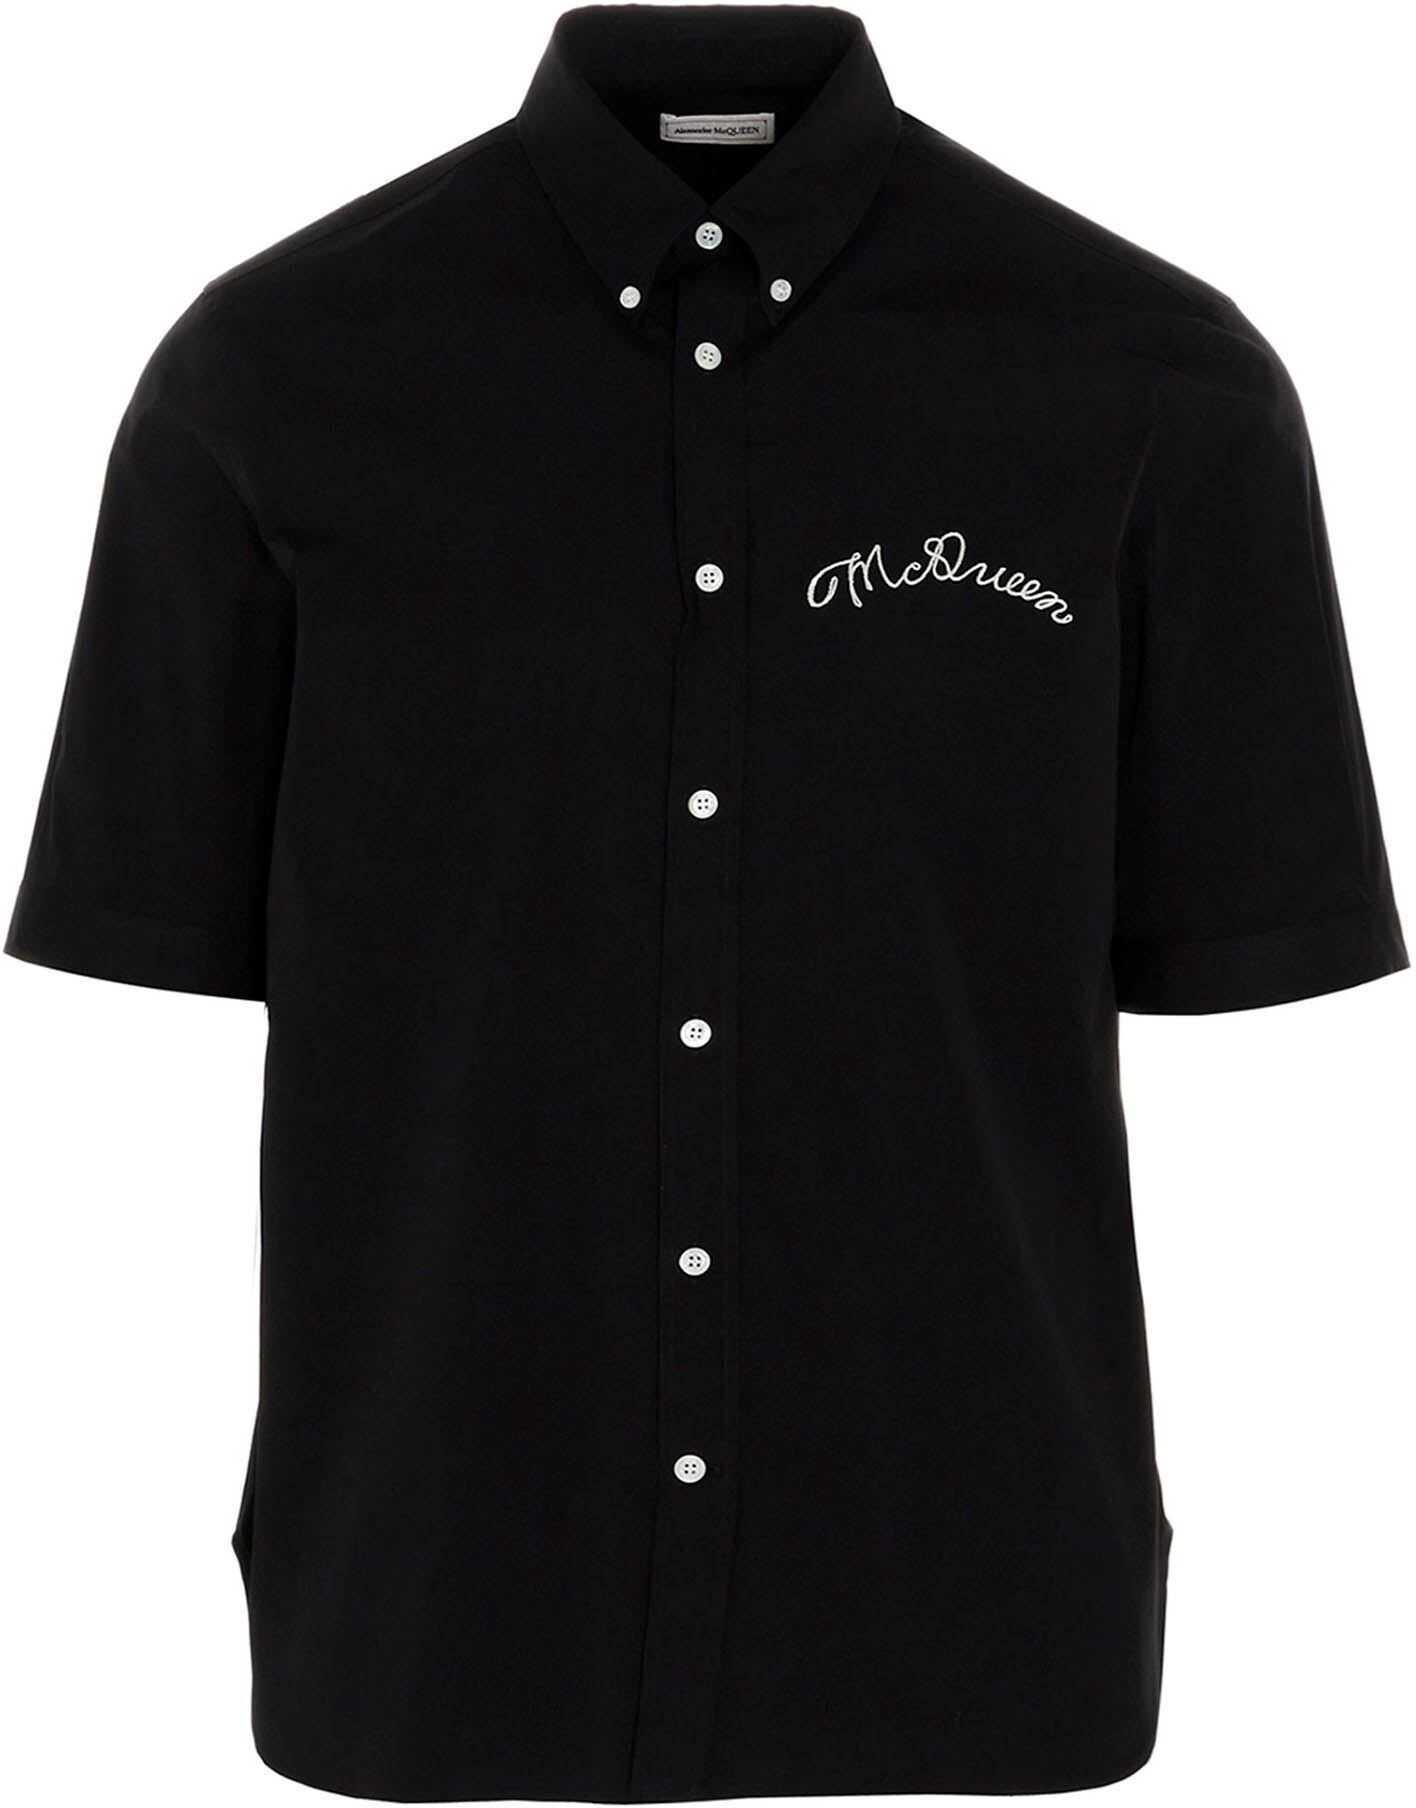 Alexander McQueen Short Sleeve Shirt In Black Black imagine